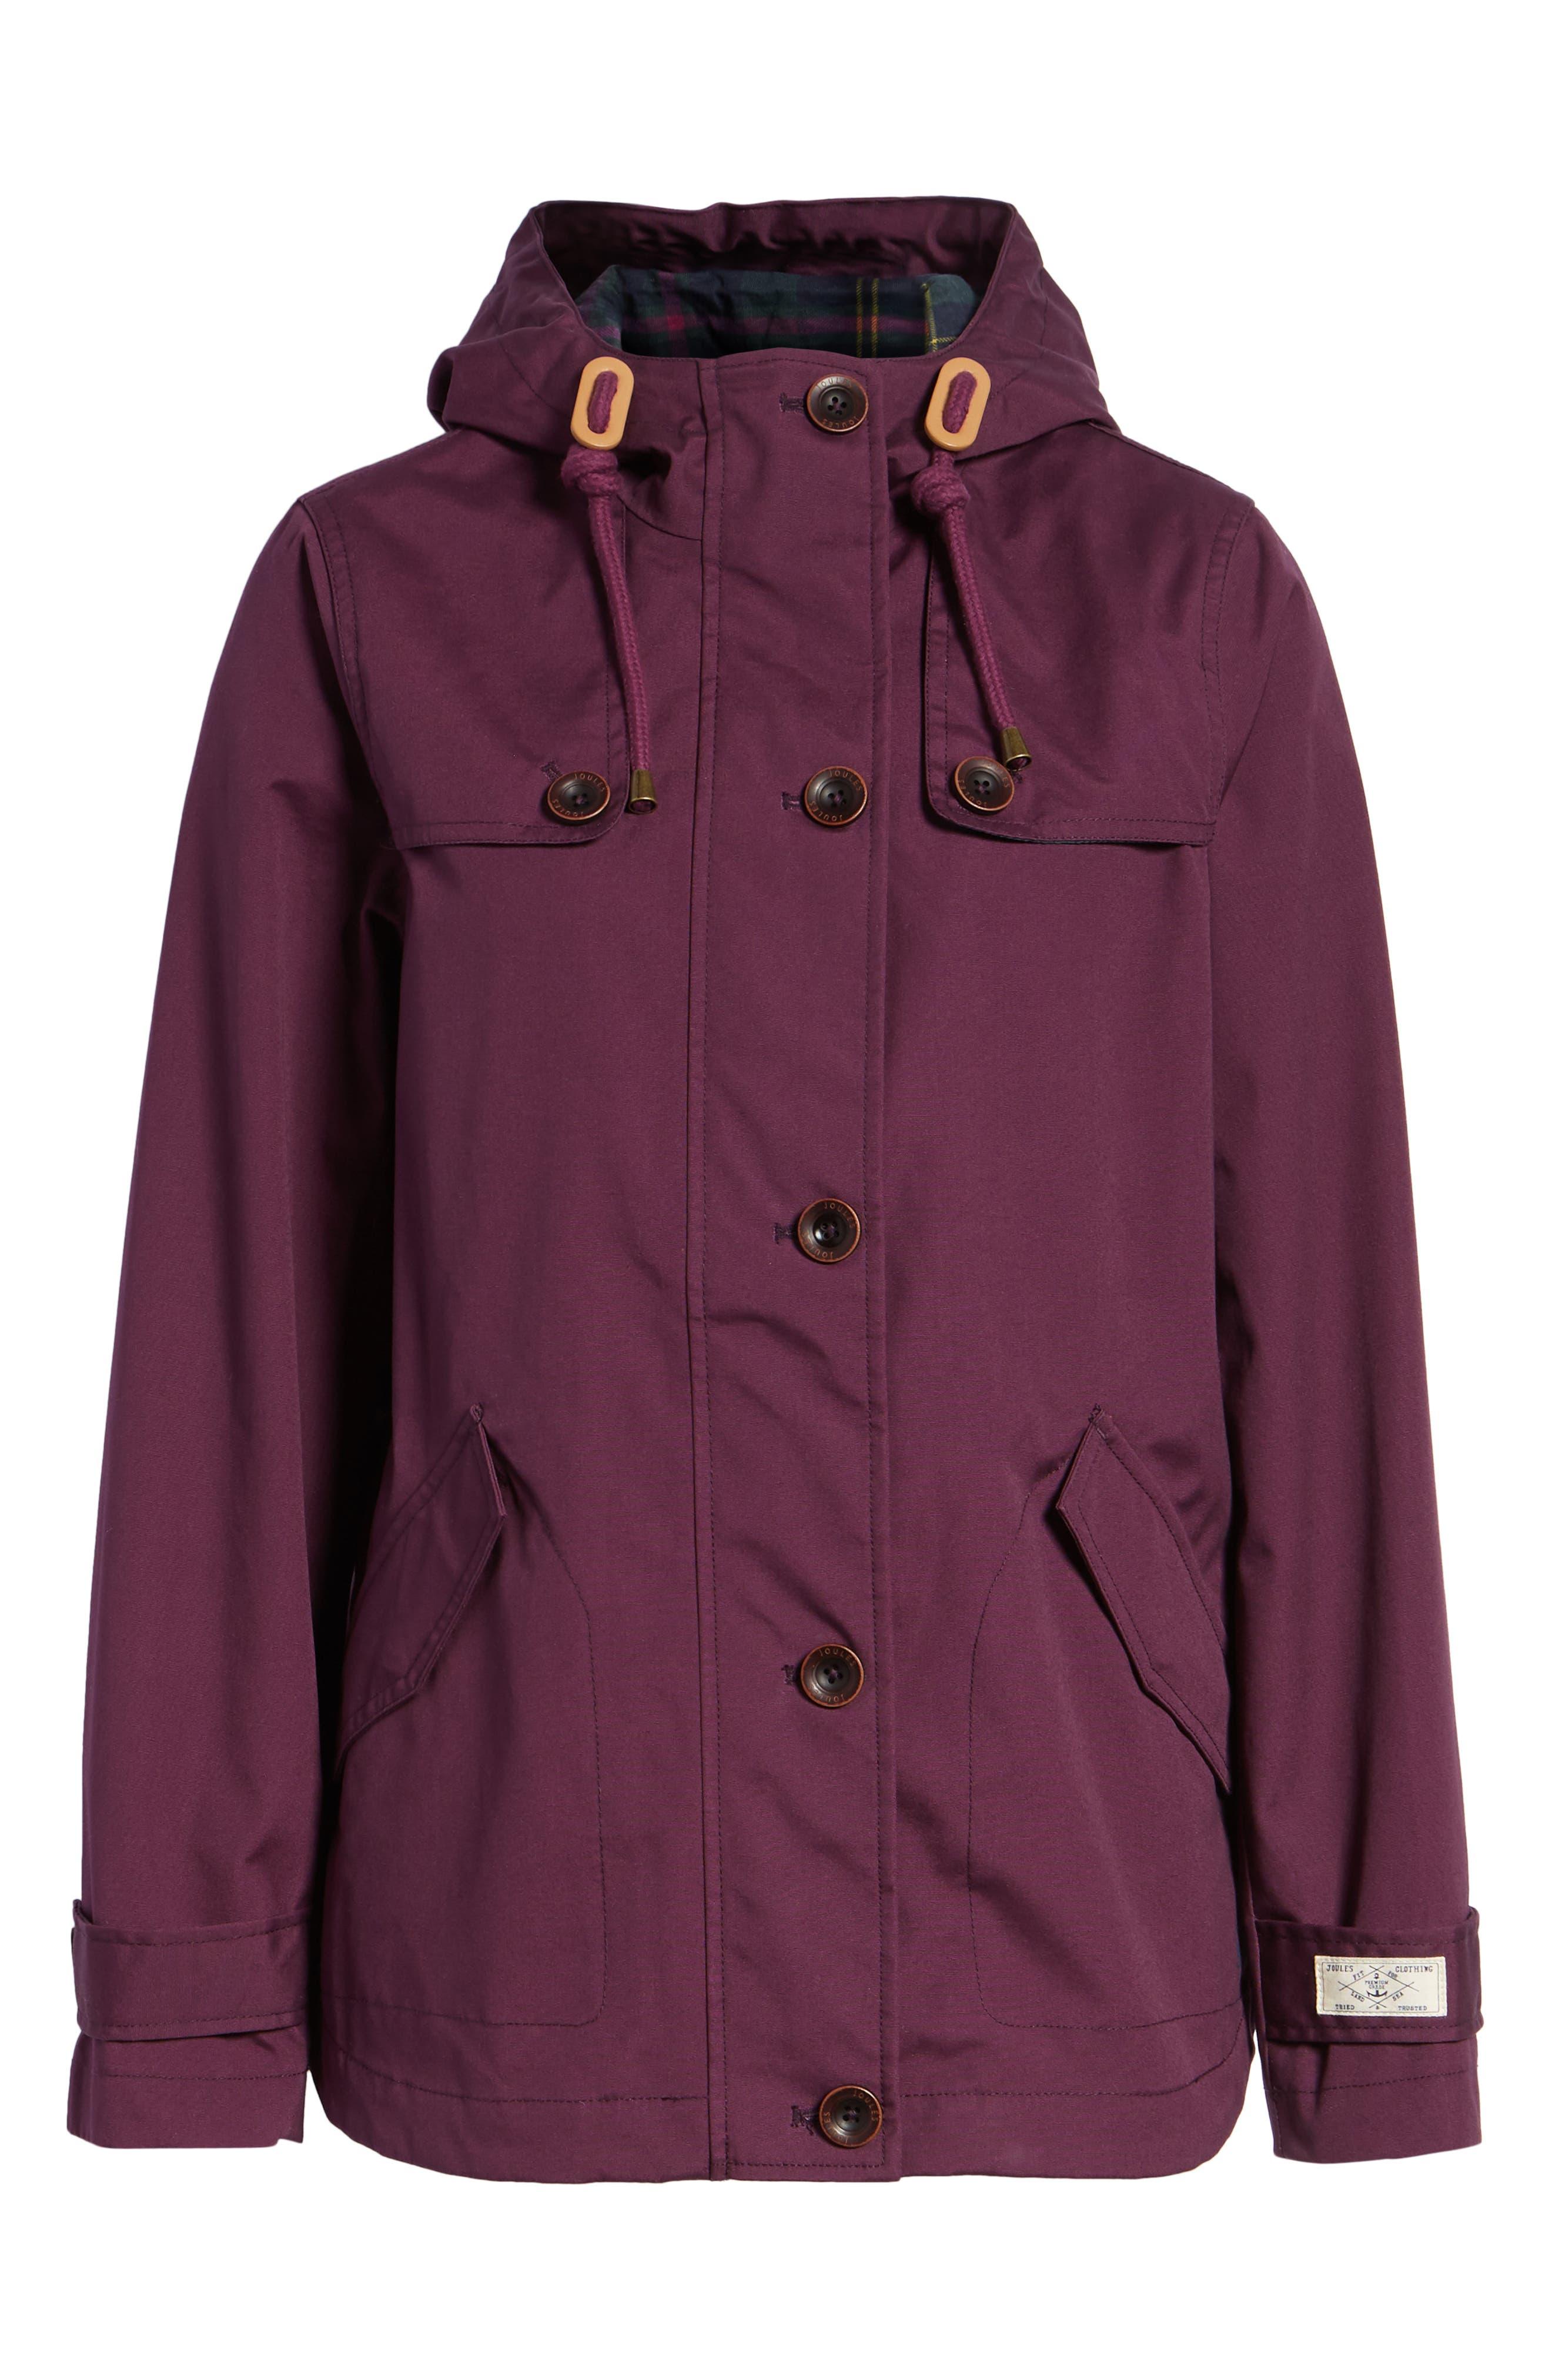 JOULES,                             Right as Rain Waterproof Hooded Jacket,                             Alternate thumbnail 6, color,                             930